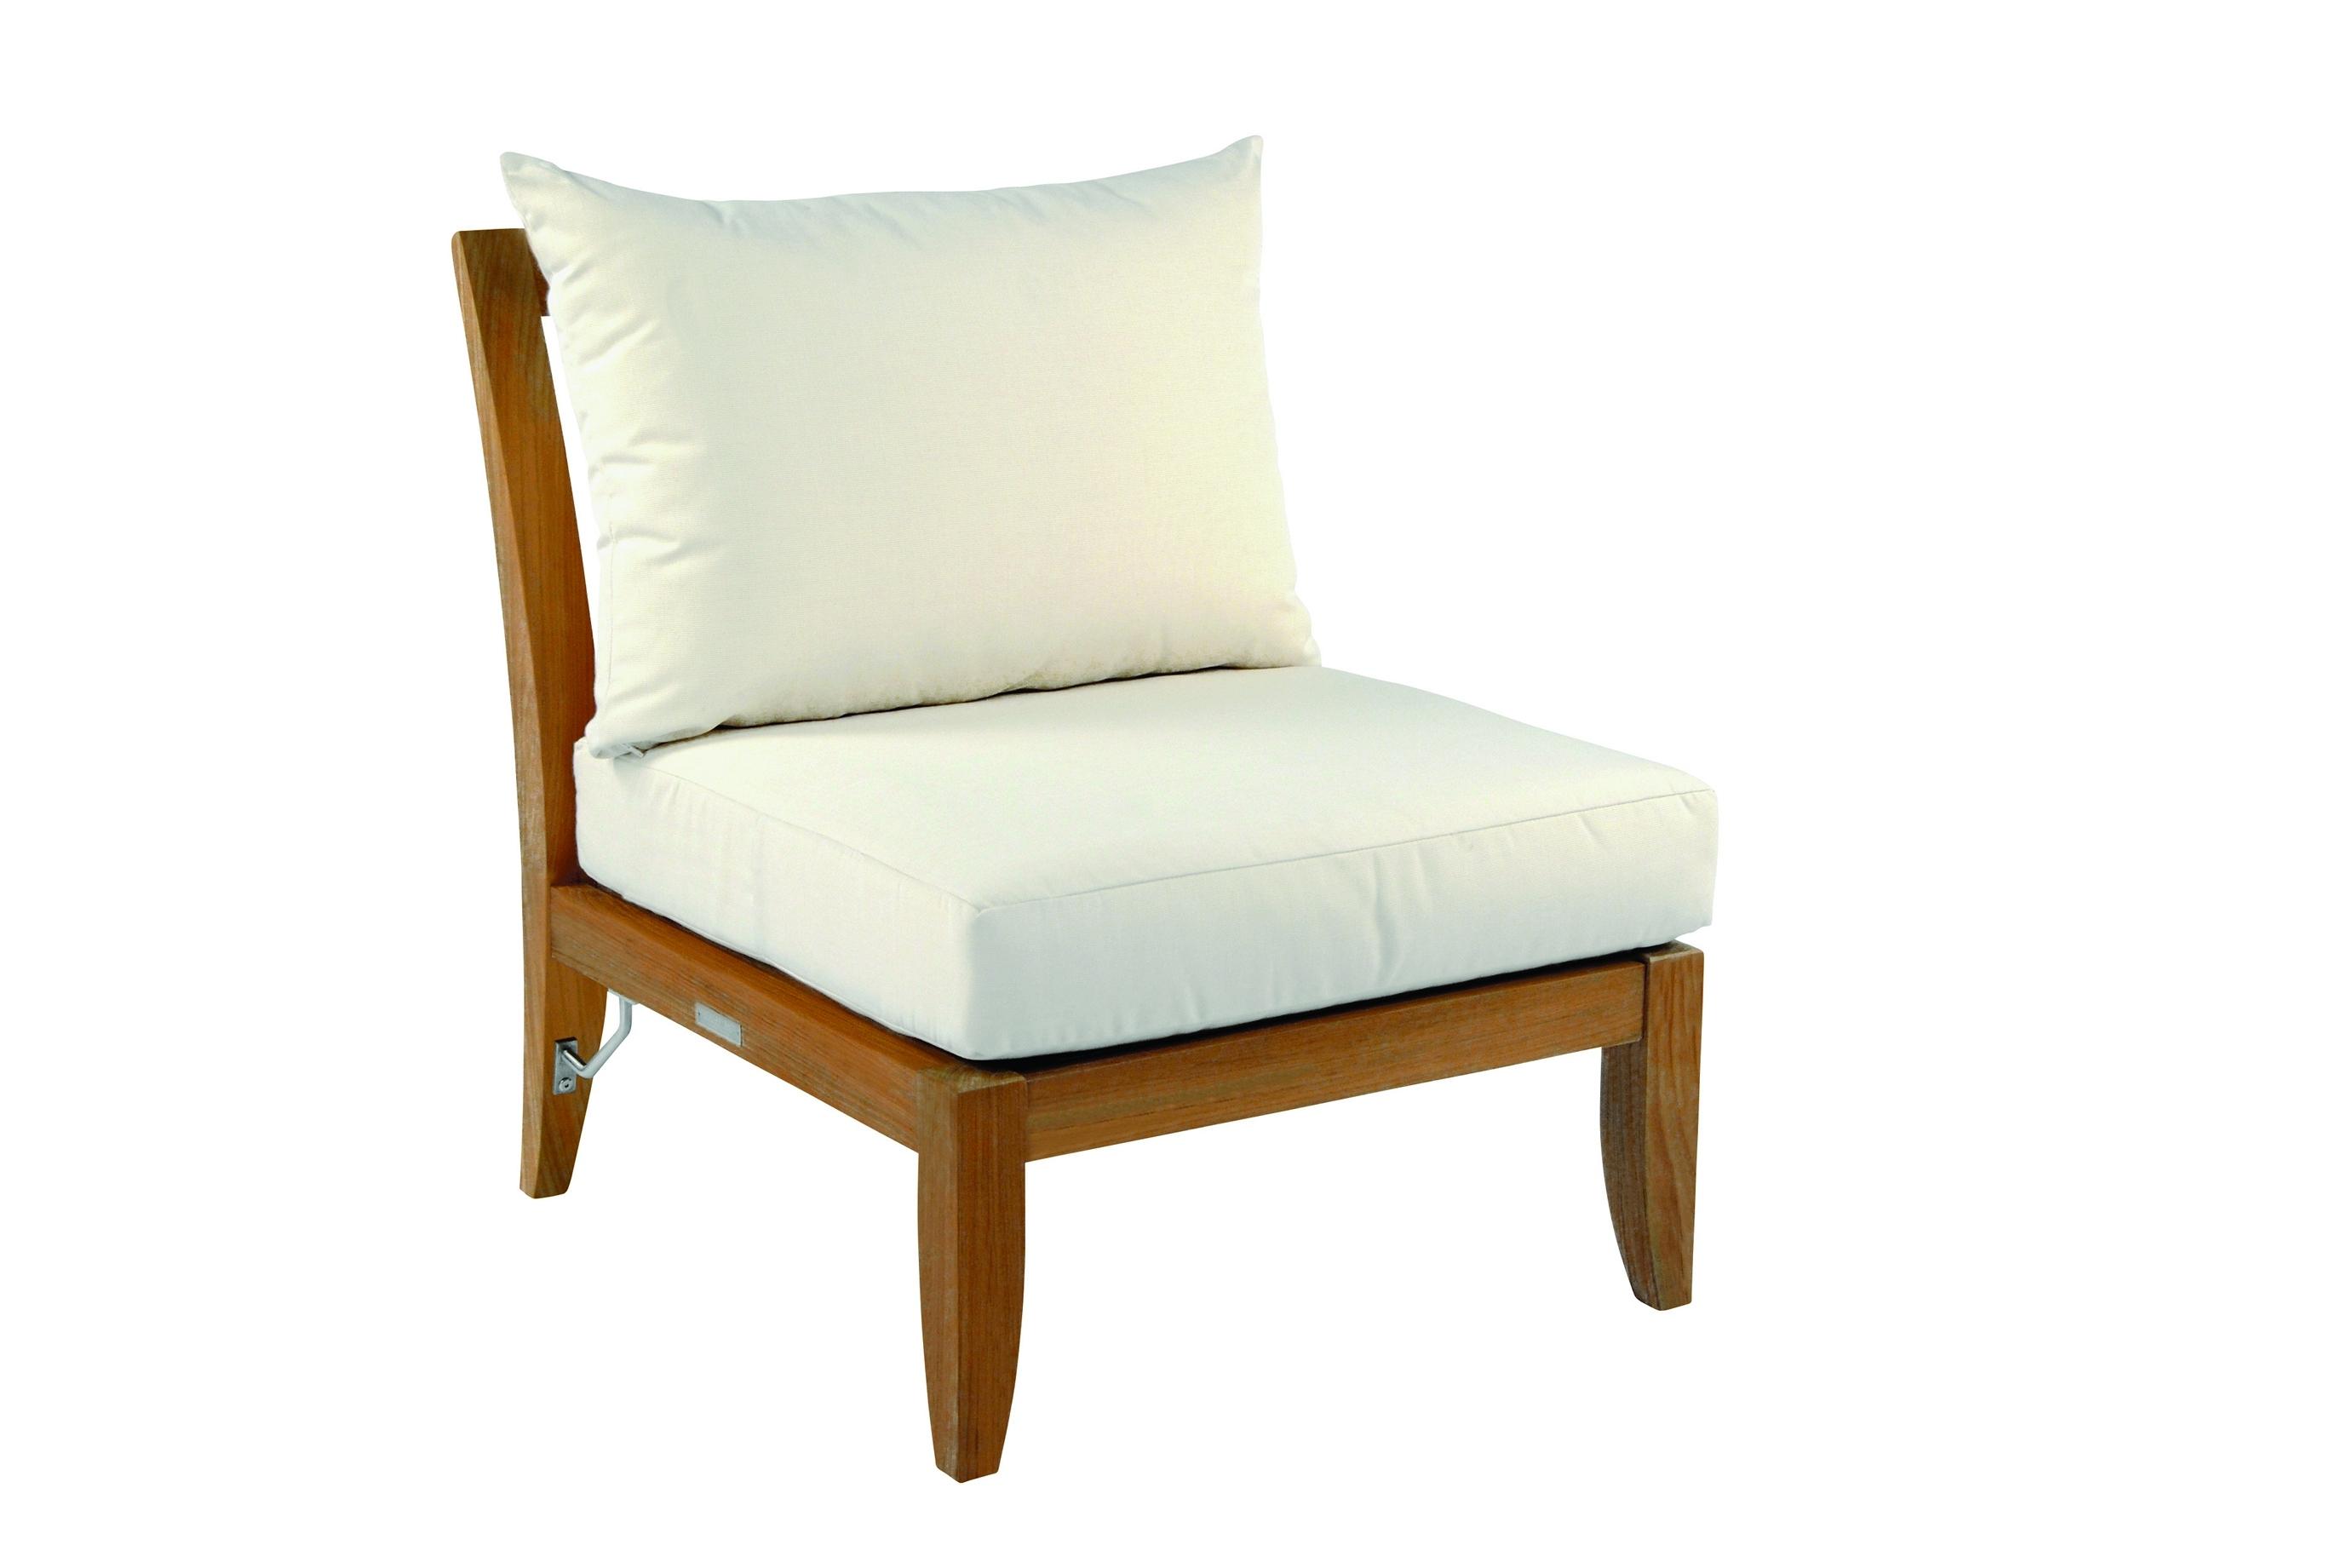 Kingsley-Bate Ipanema Teak Sectional-Armless Chair